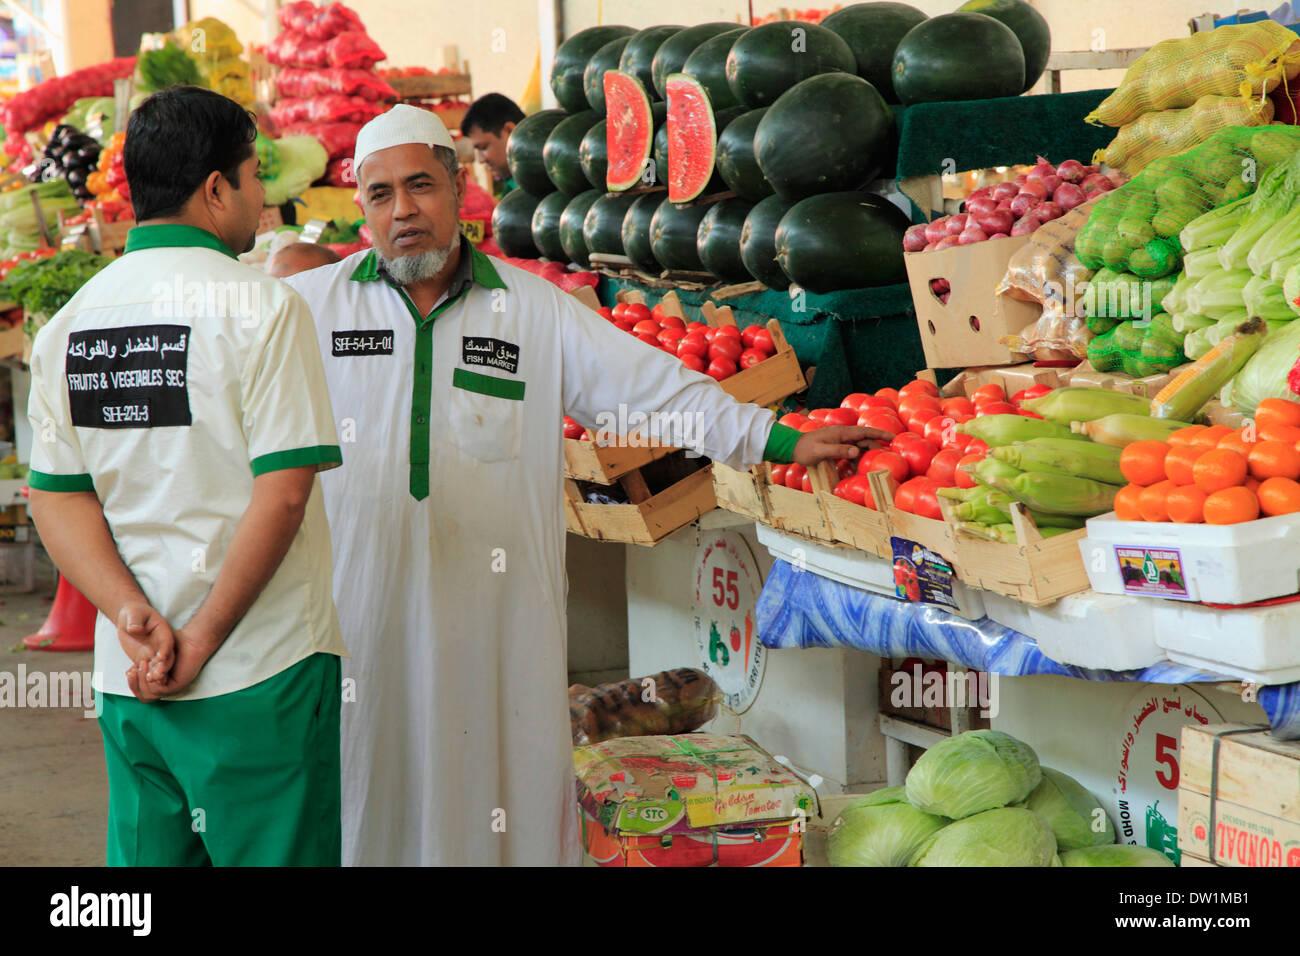 Vegetable Market Dubai Stock Photos & Vegetable Market Dubai